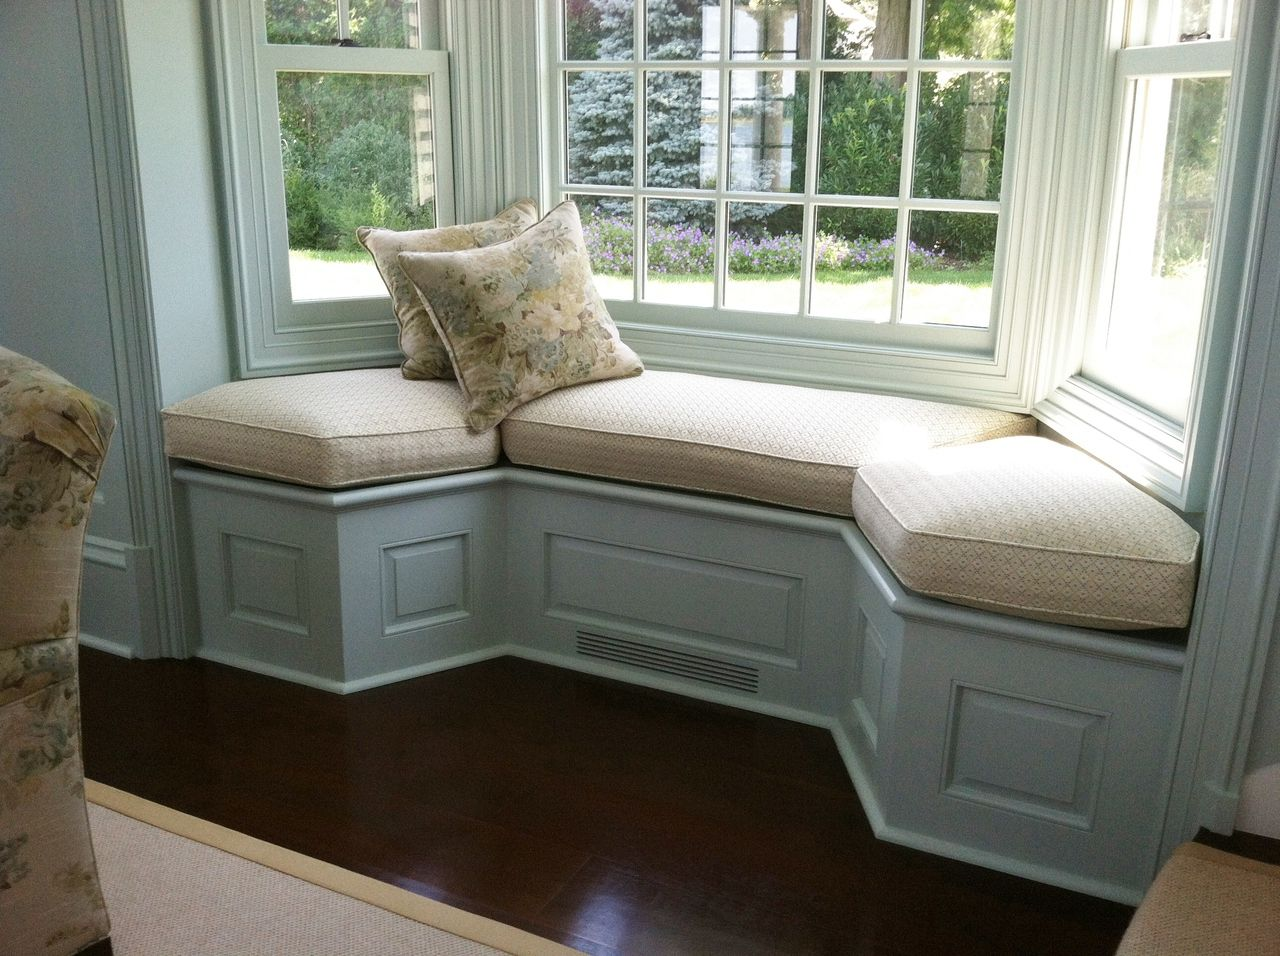 bay window sofa seating sofas y butacas vintage country seat cushion cushions